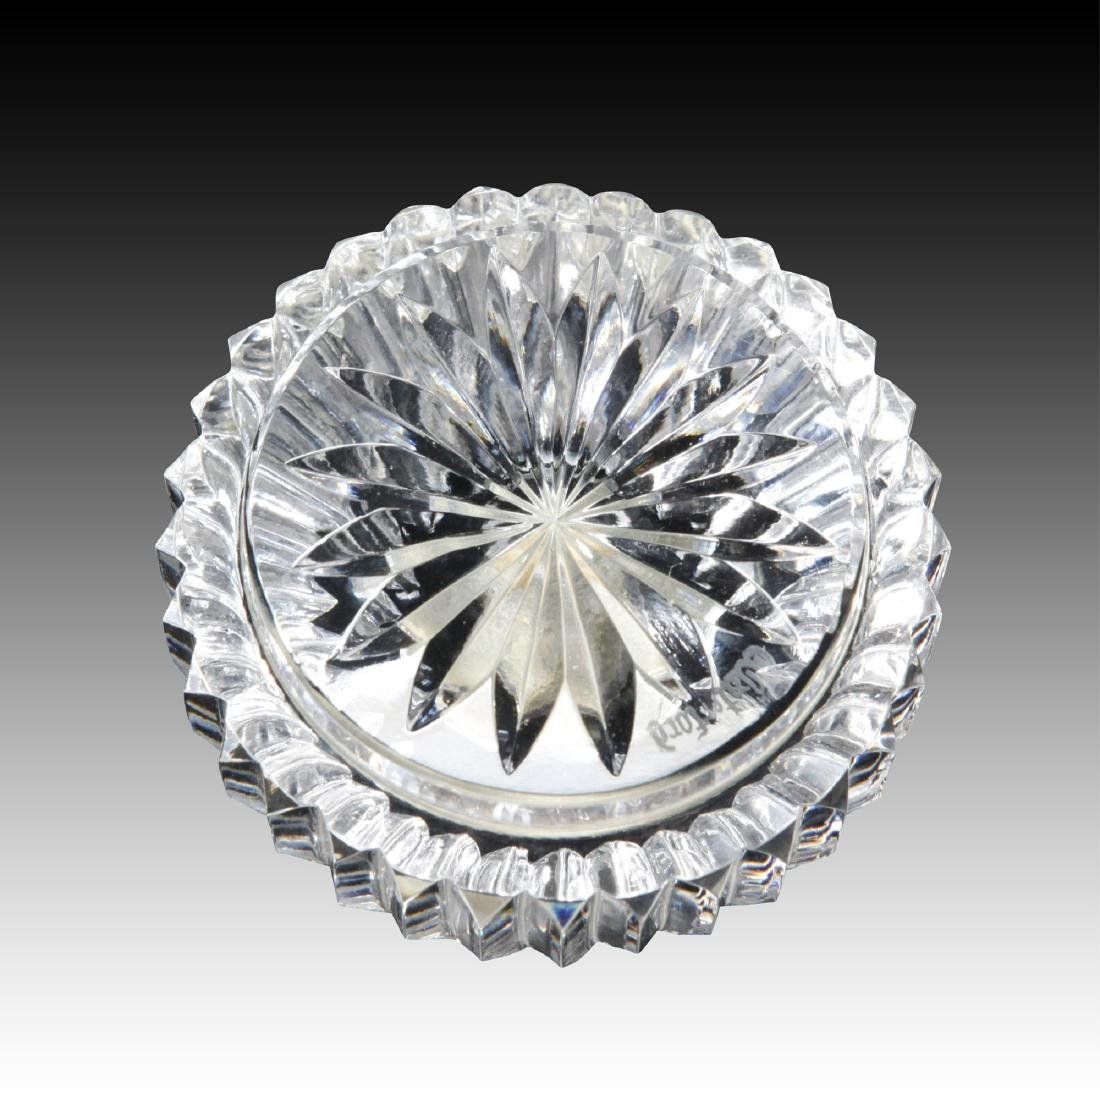 8PC WATERFORD LISMORE GLASSES, CLOCK, PEN HOLDER - 8